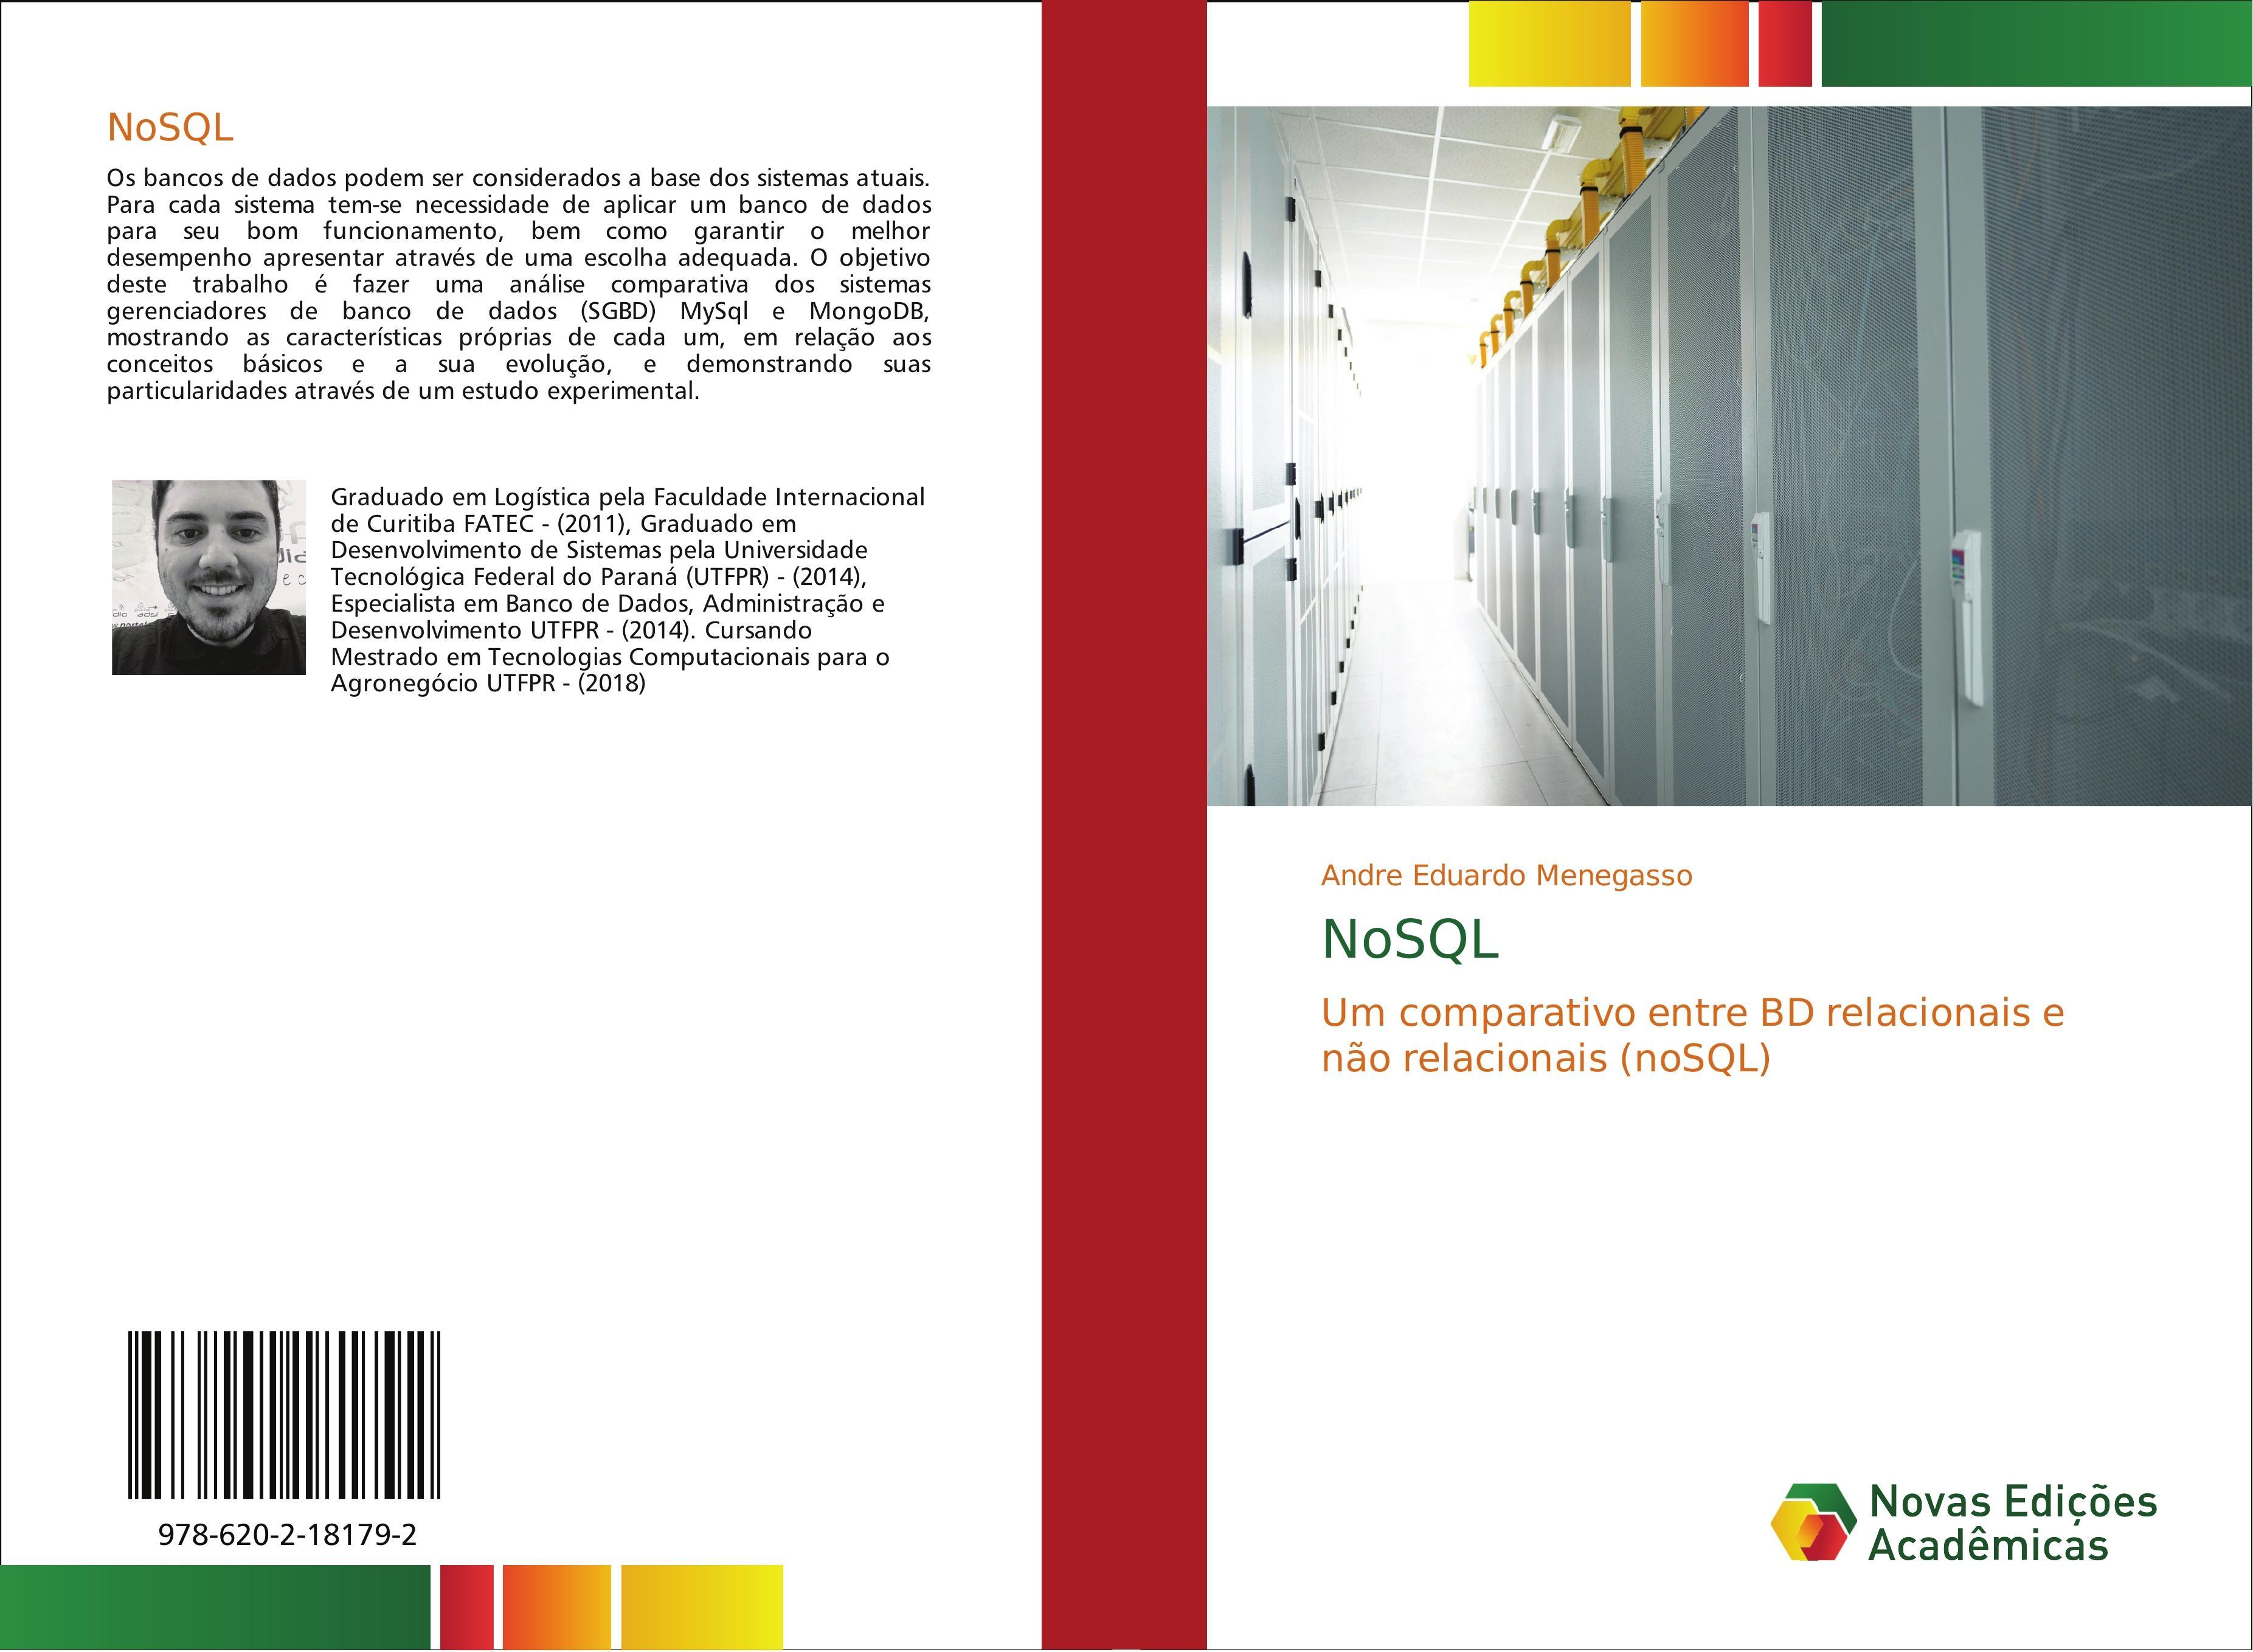 NoSQL - Menegasso, Andre Eduardo